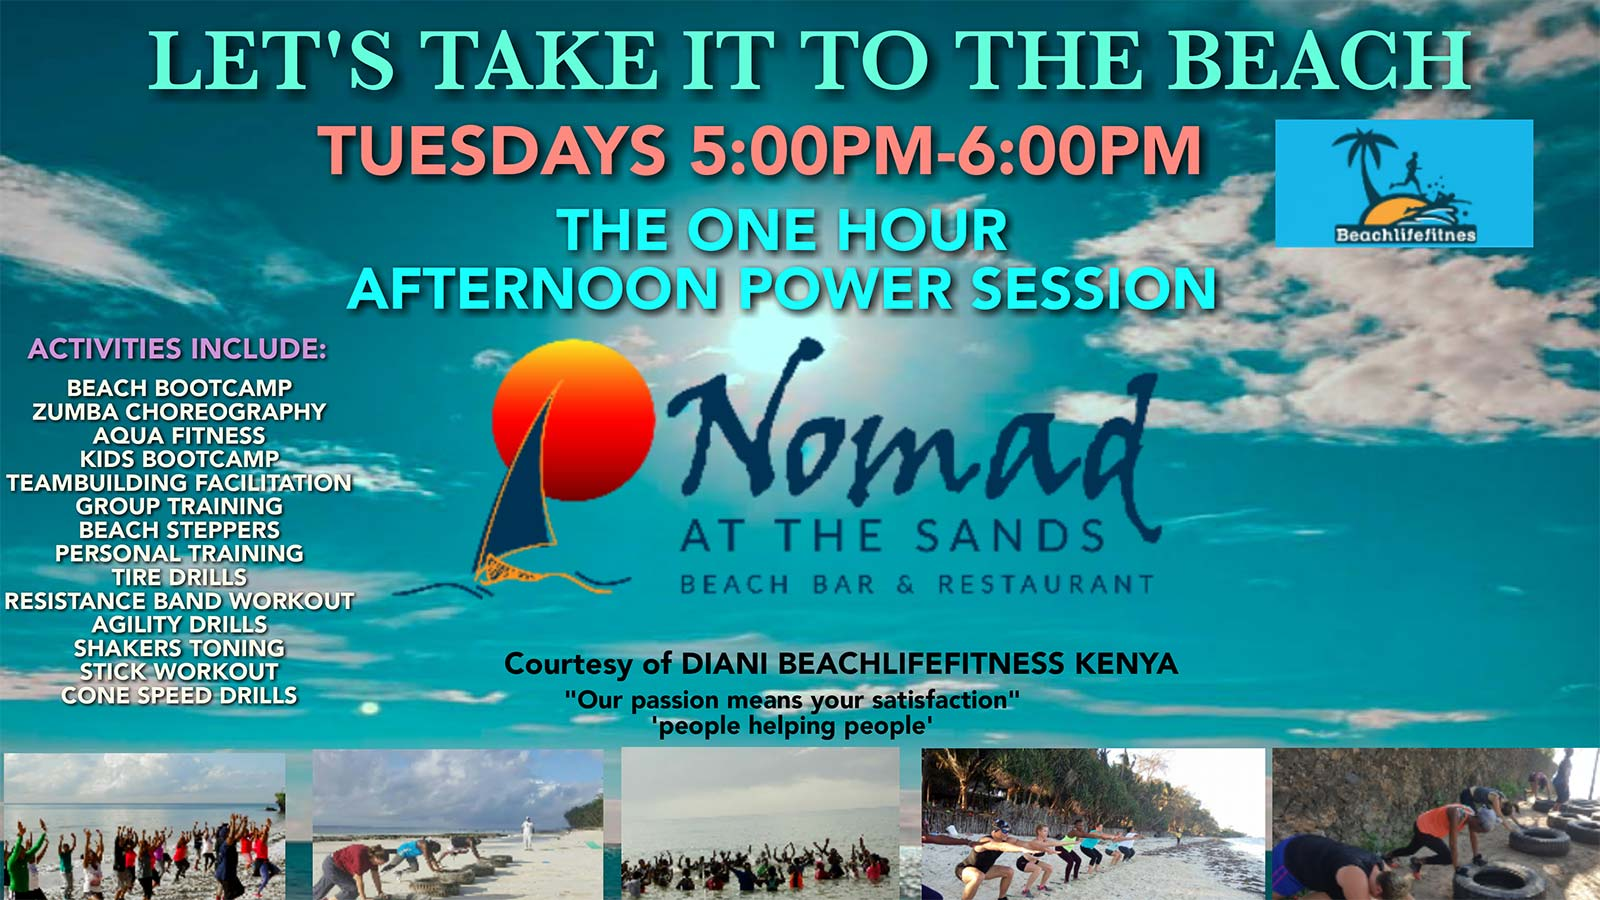 Nomad Beach Bar Events